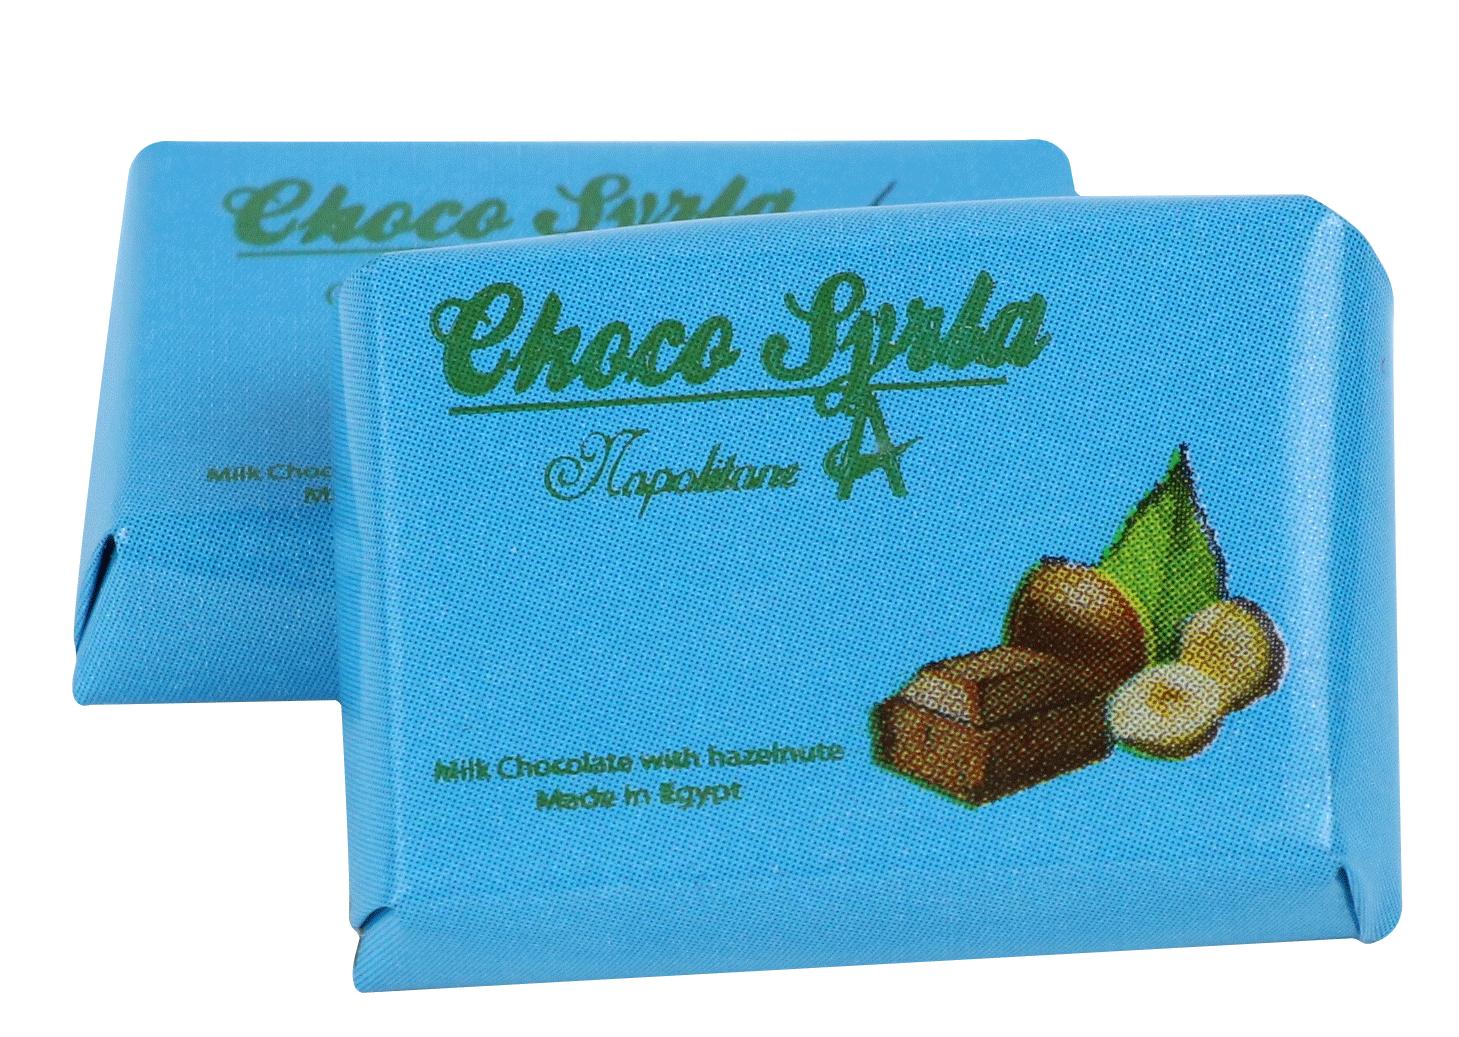 Napolitan chocolate 7 grams